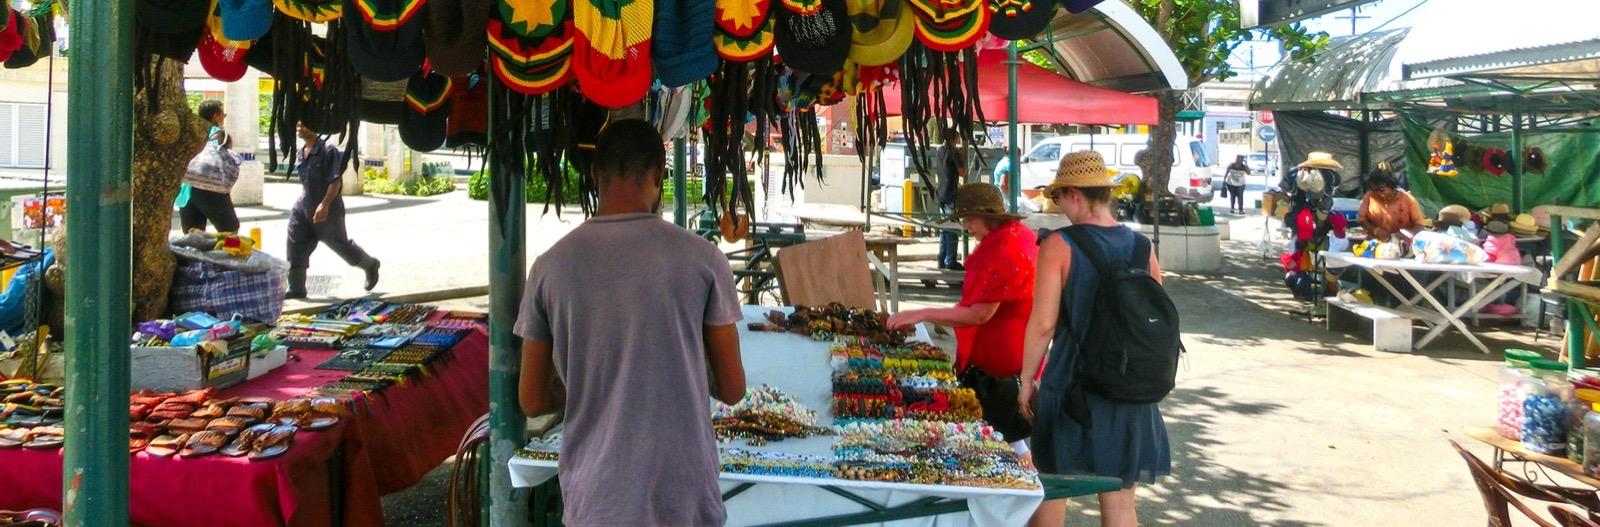 Shopping på Barbados